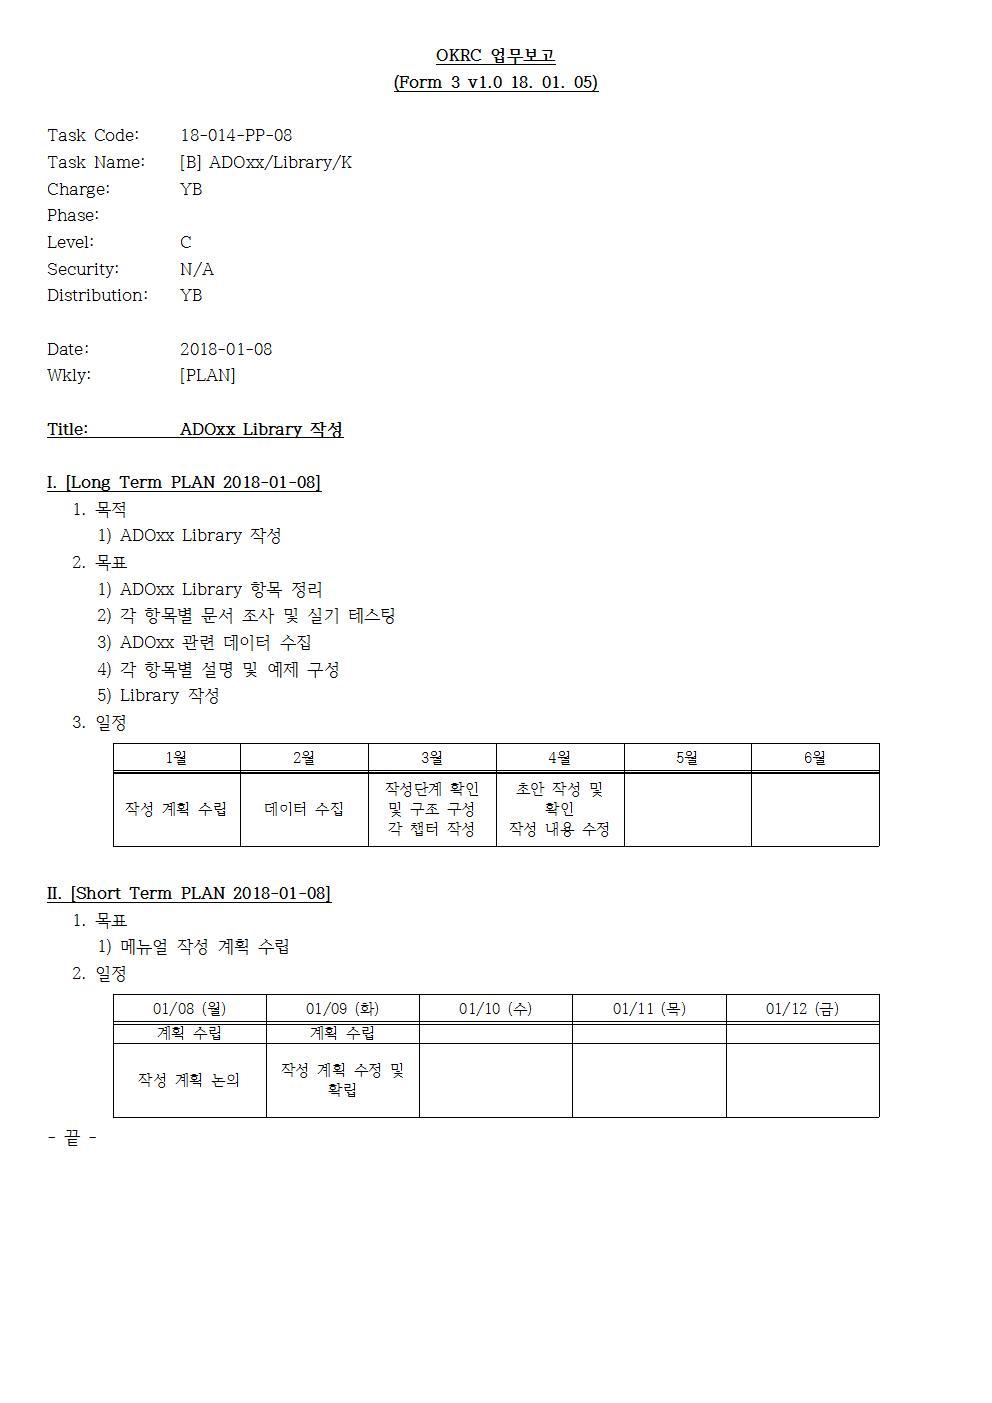 D-[18-014-PP-08]-[ADOxx Library K]-[2018-01-08][YB]001.jpg